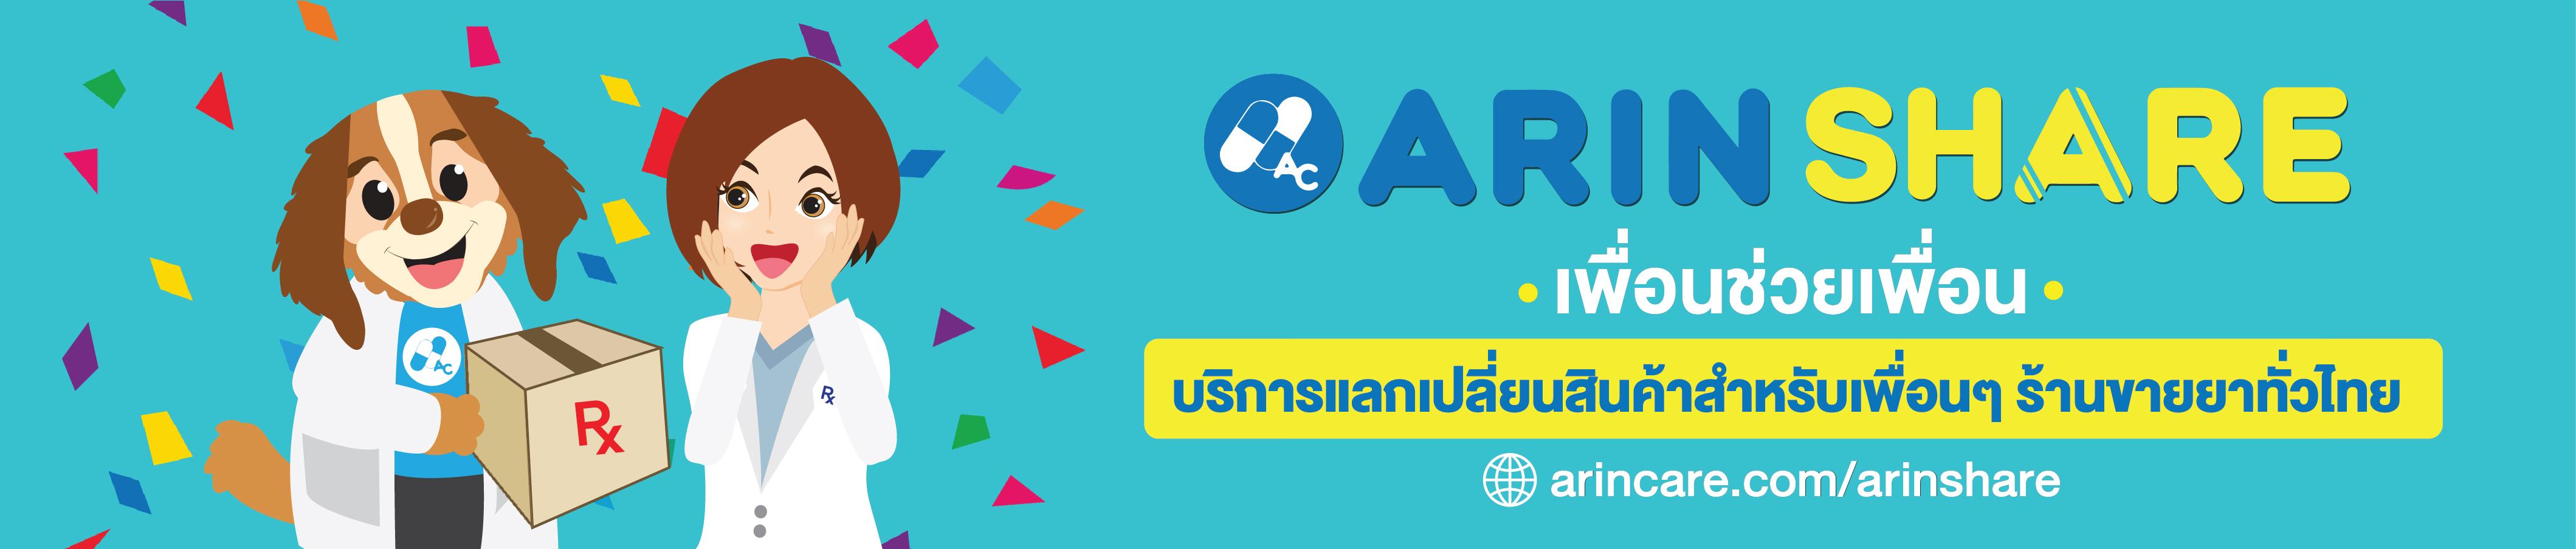 ARINSHARE: เพื่อนช่วยเพื่อน - บริการช่วยระบายสินค้าสำหรับเพื่อนๆ ร้านขายยาทั่วไทย :)